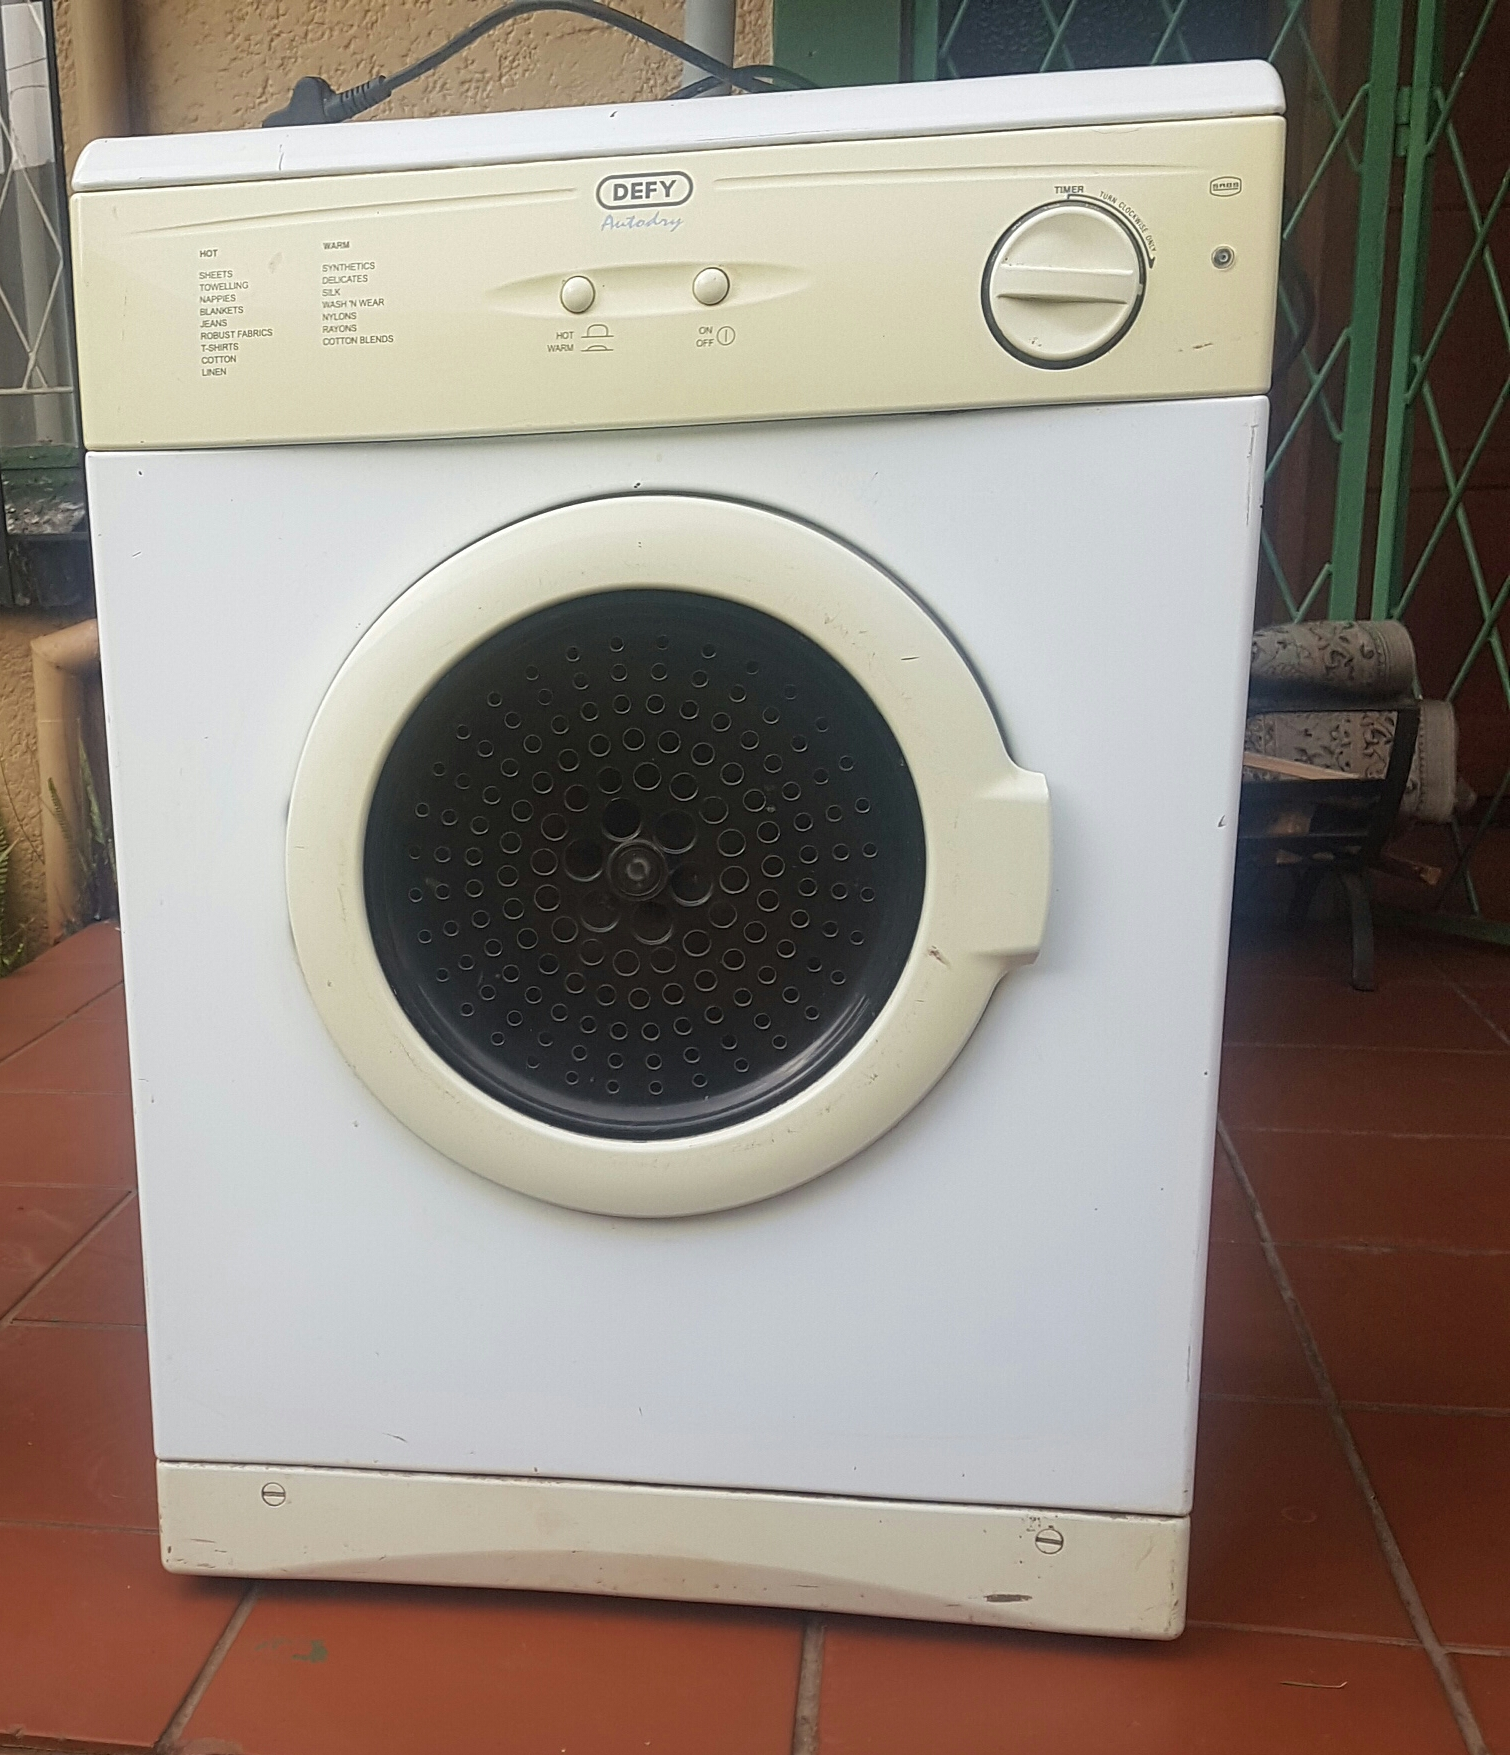 5kg Defy tumble dryer